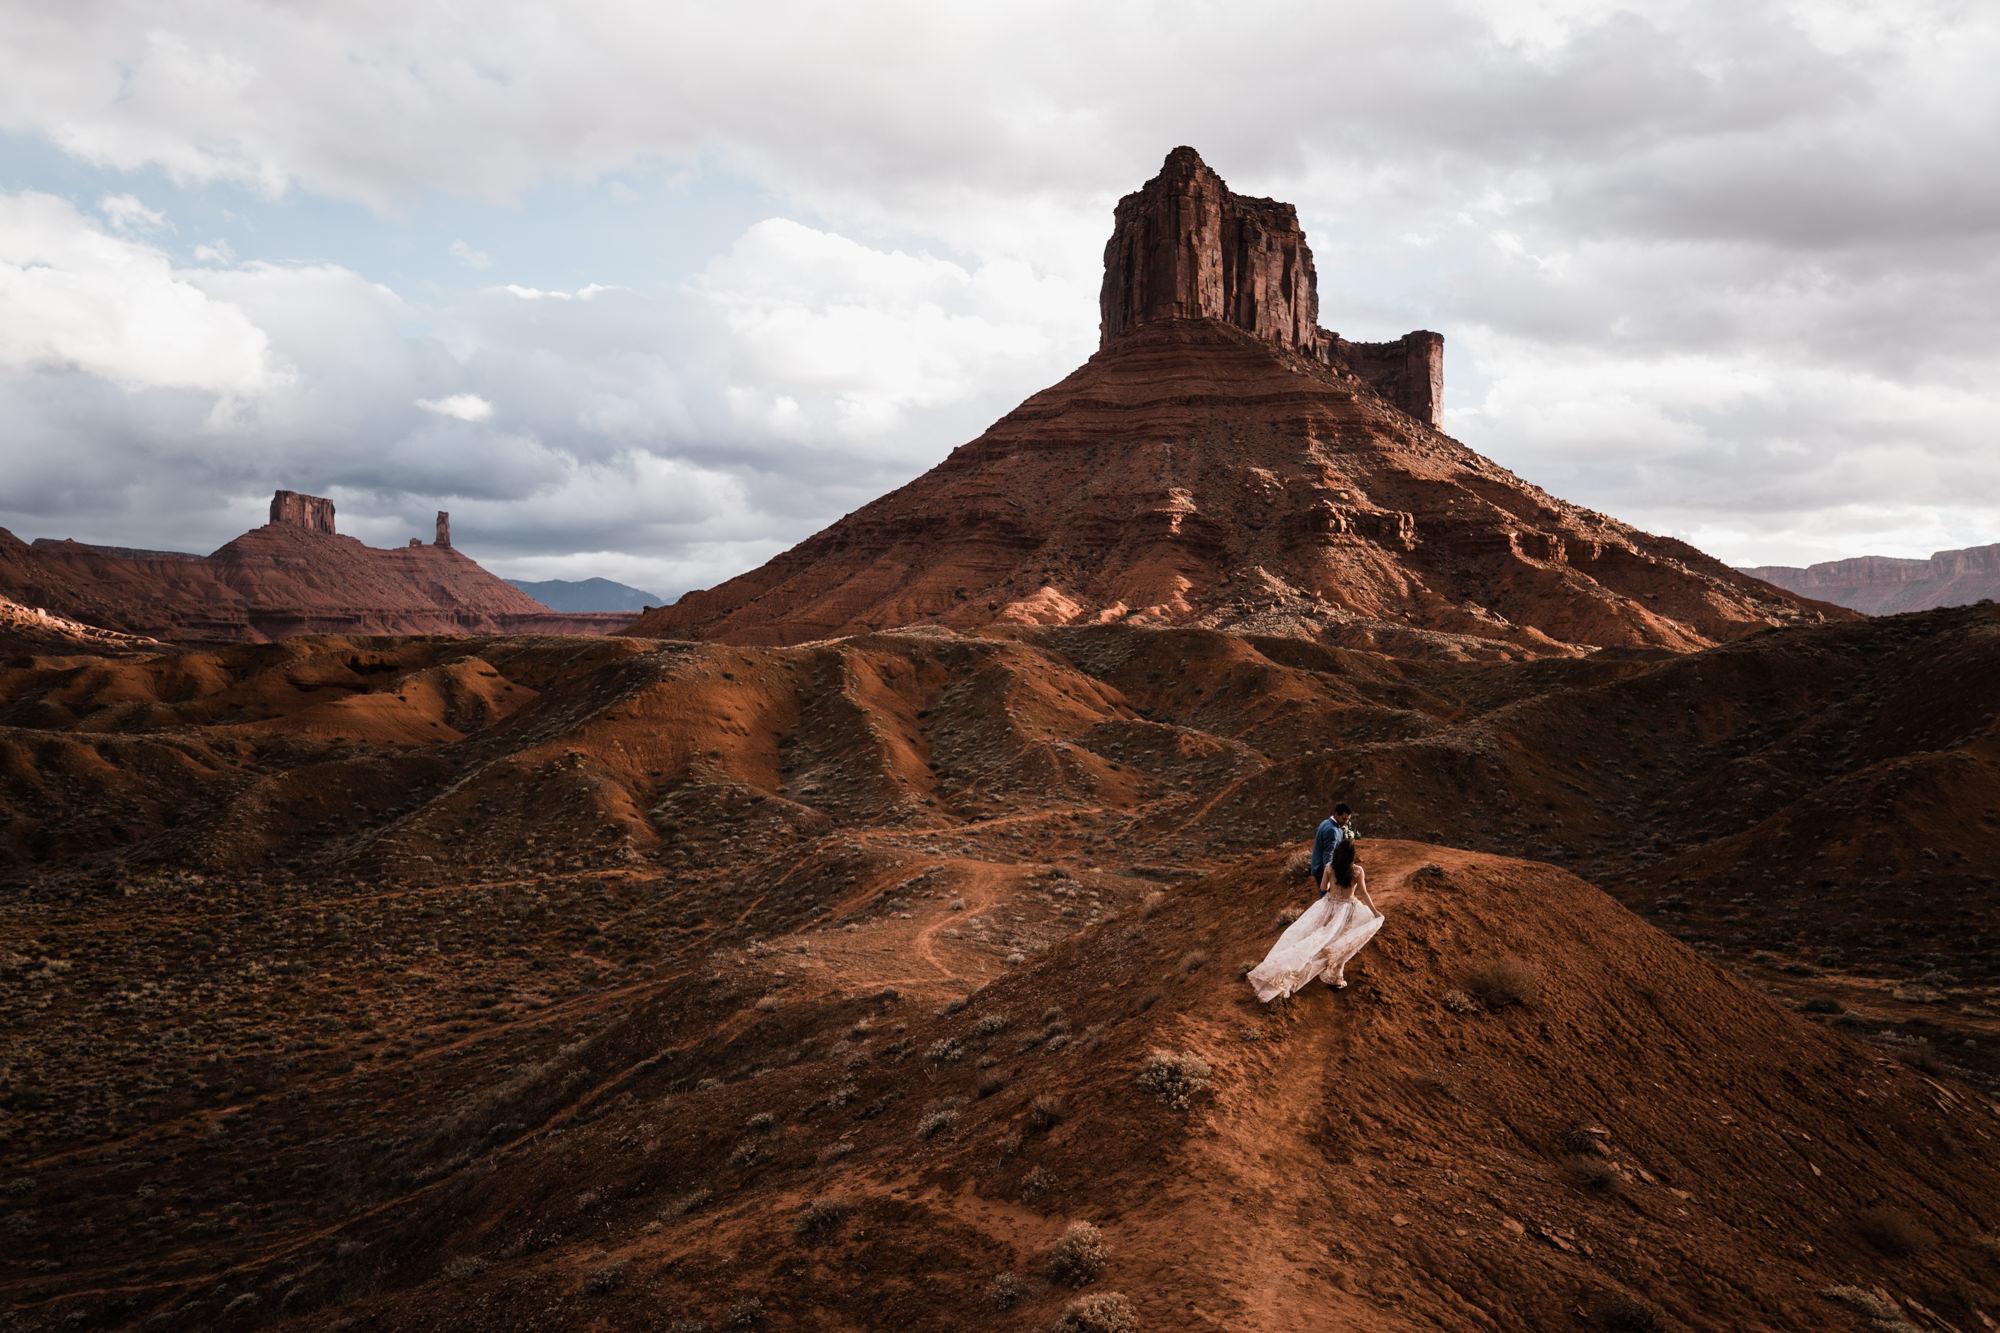 Elopement Bridals In Moab Utah Desert Adventure Wedding Photographer The Hearnes Adventure Wedding Elopement Photographers In Moab Alaska And Beyond